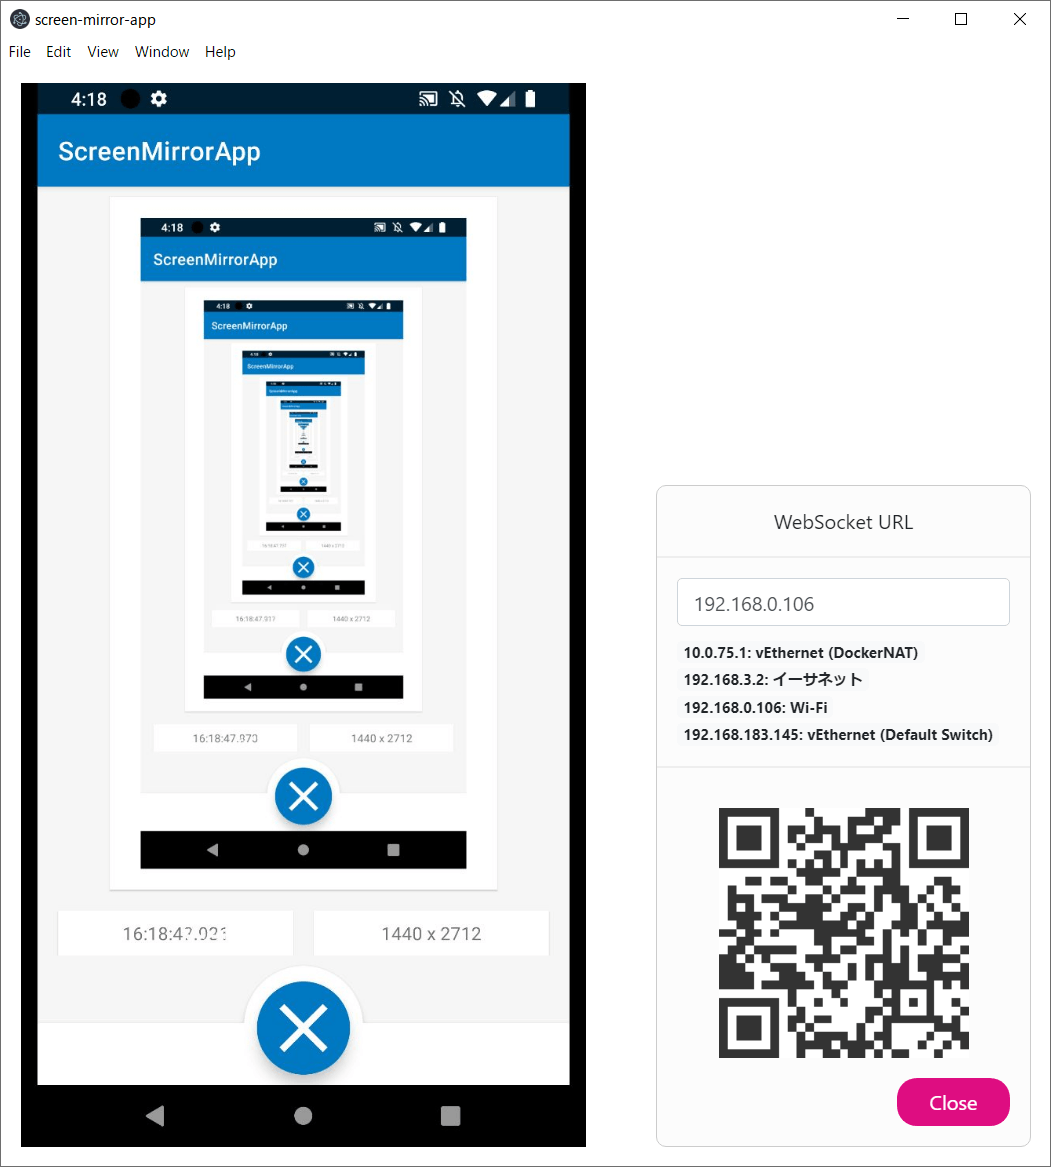 SnapCrab_screen-mirror-app_2019-10-7_1-18-48_No-00.png